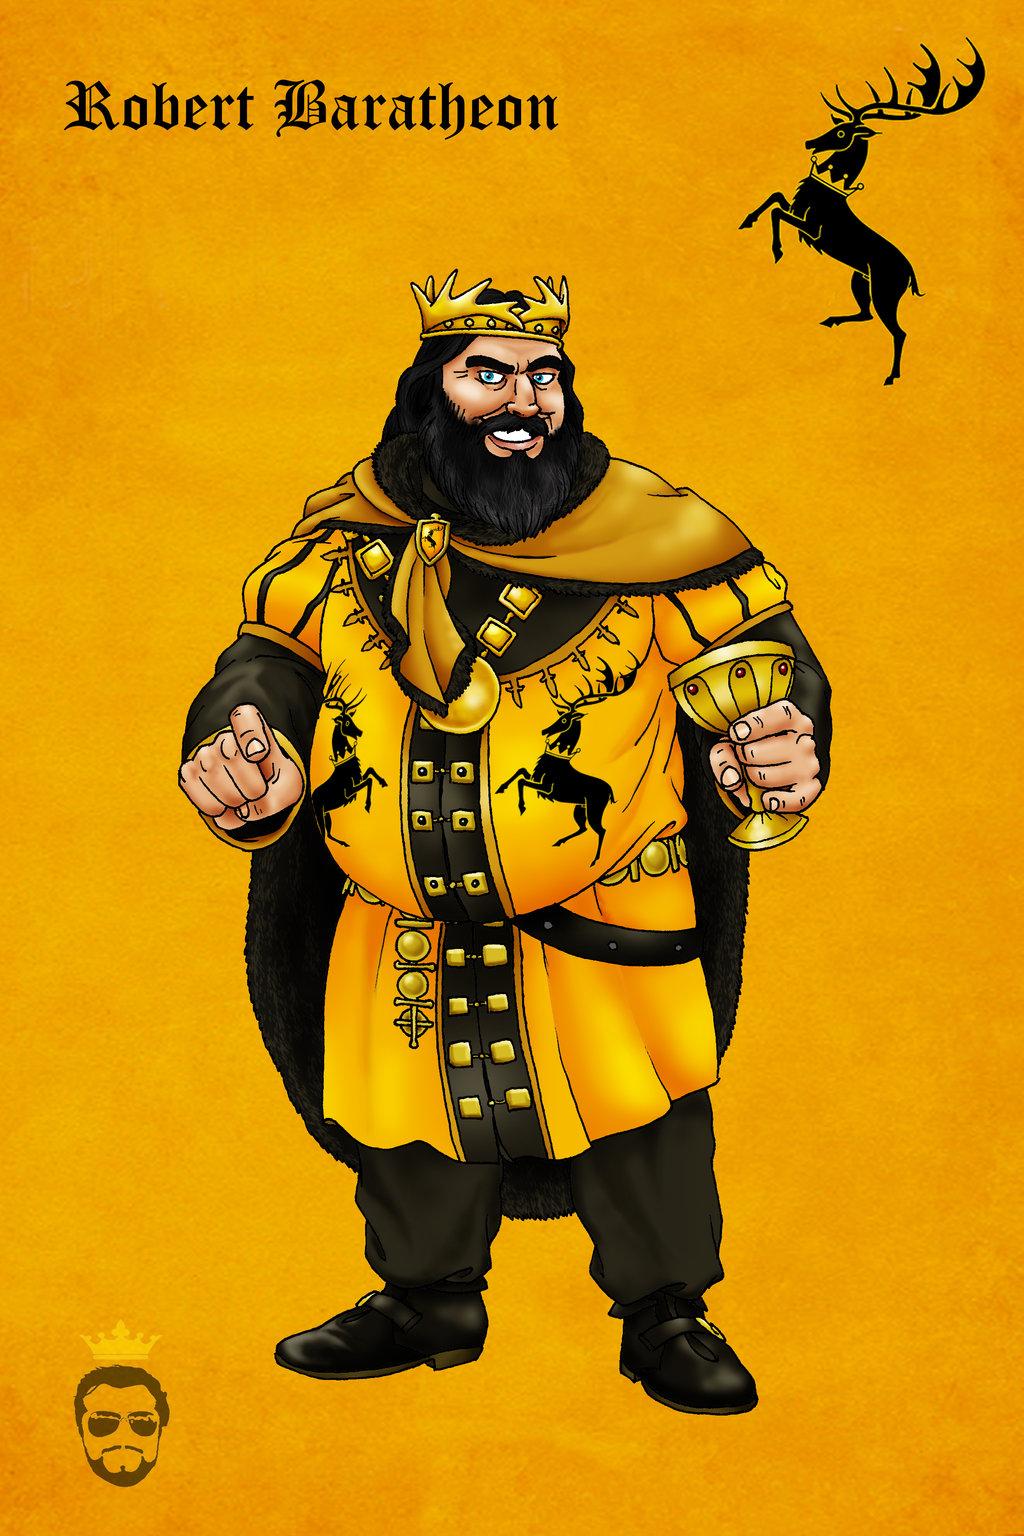 Robert Baratheon clipart #5, Download drawings